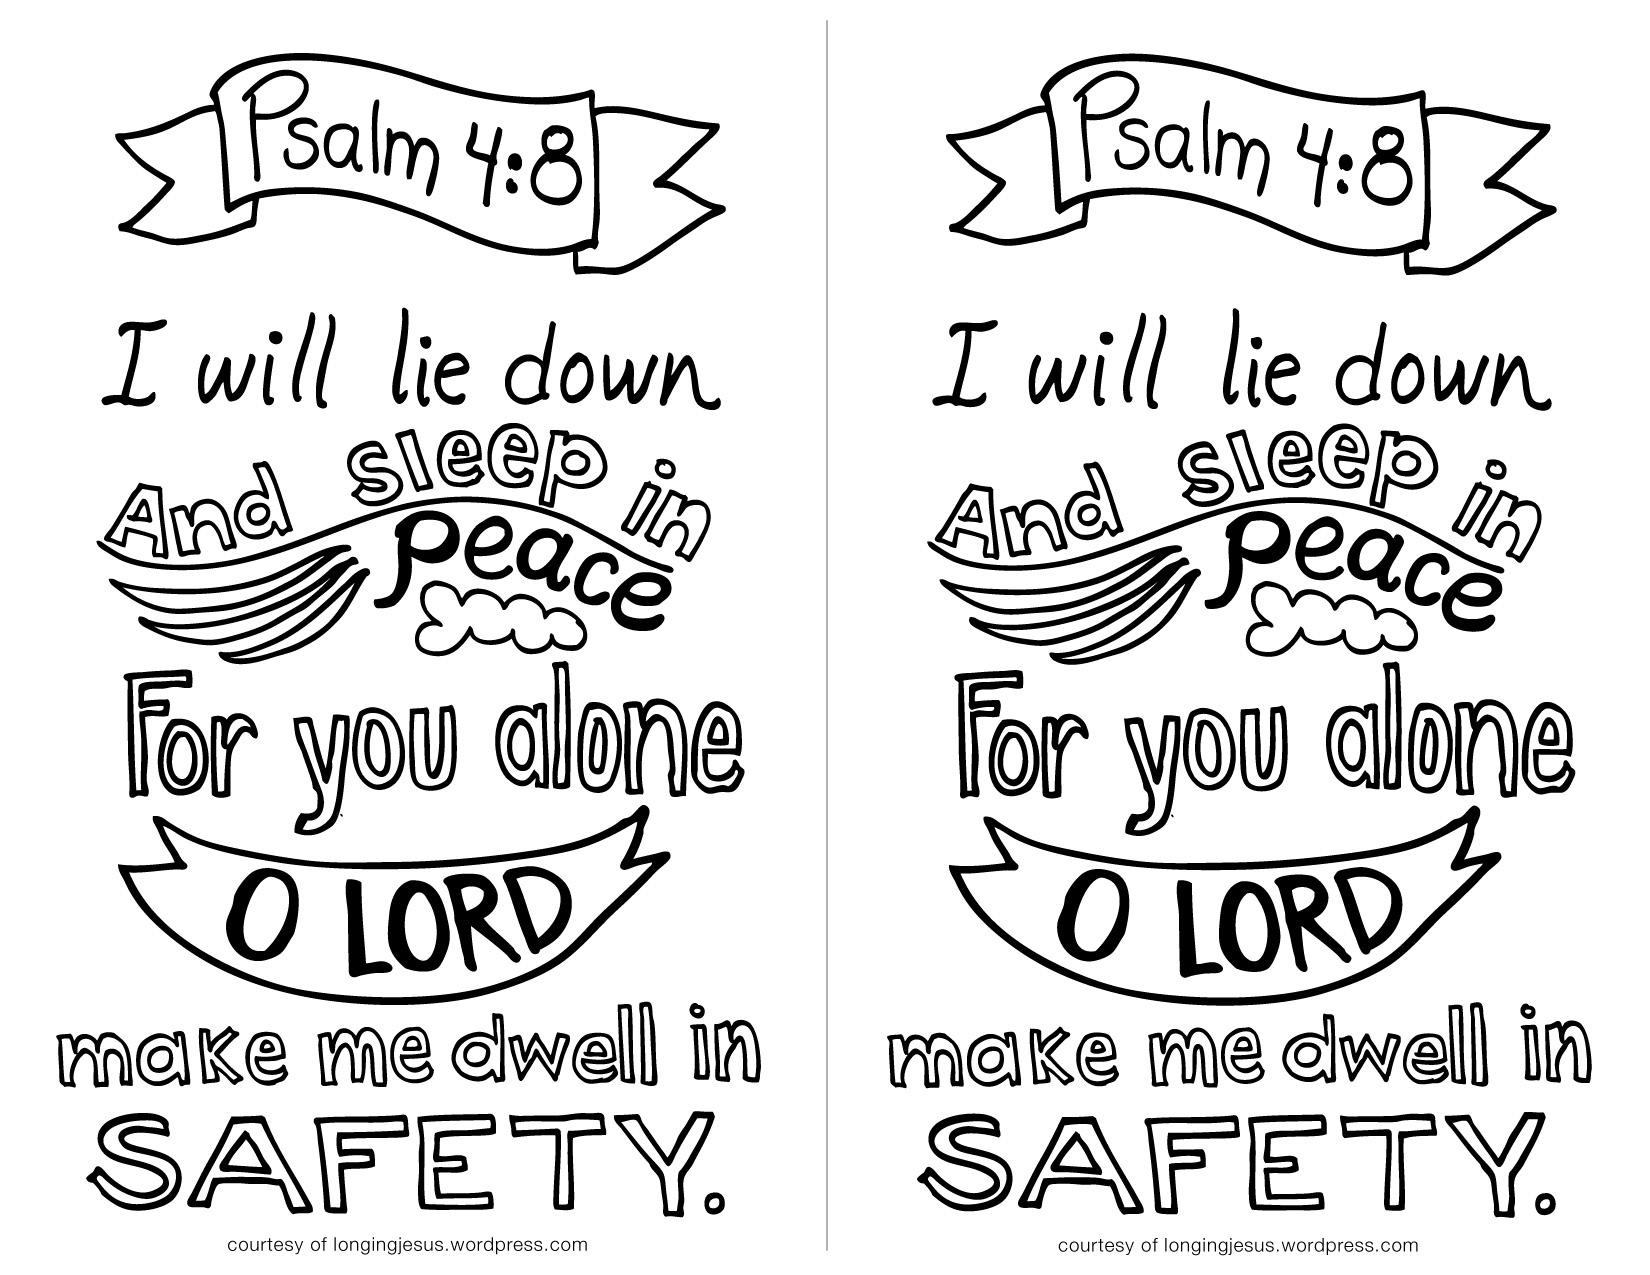 AWANA weekly verse reminders